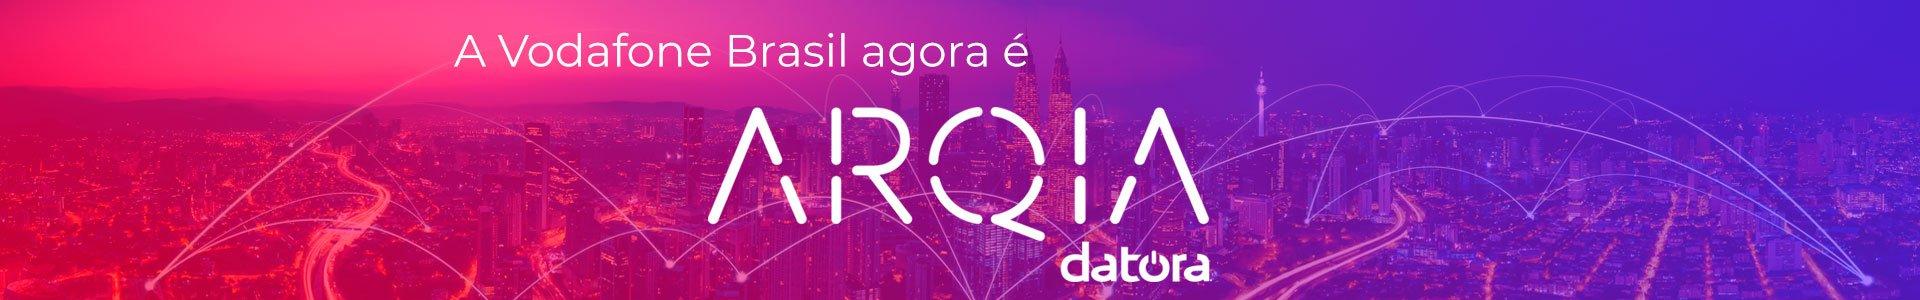 Vodafone Brasil agora é Arqia